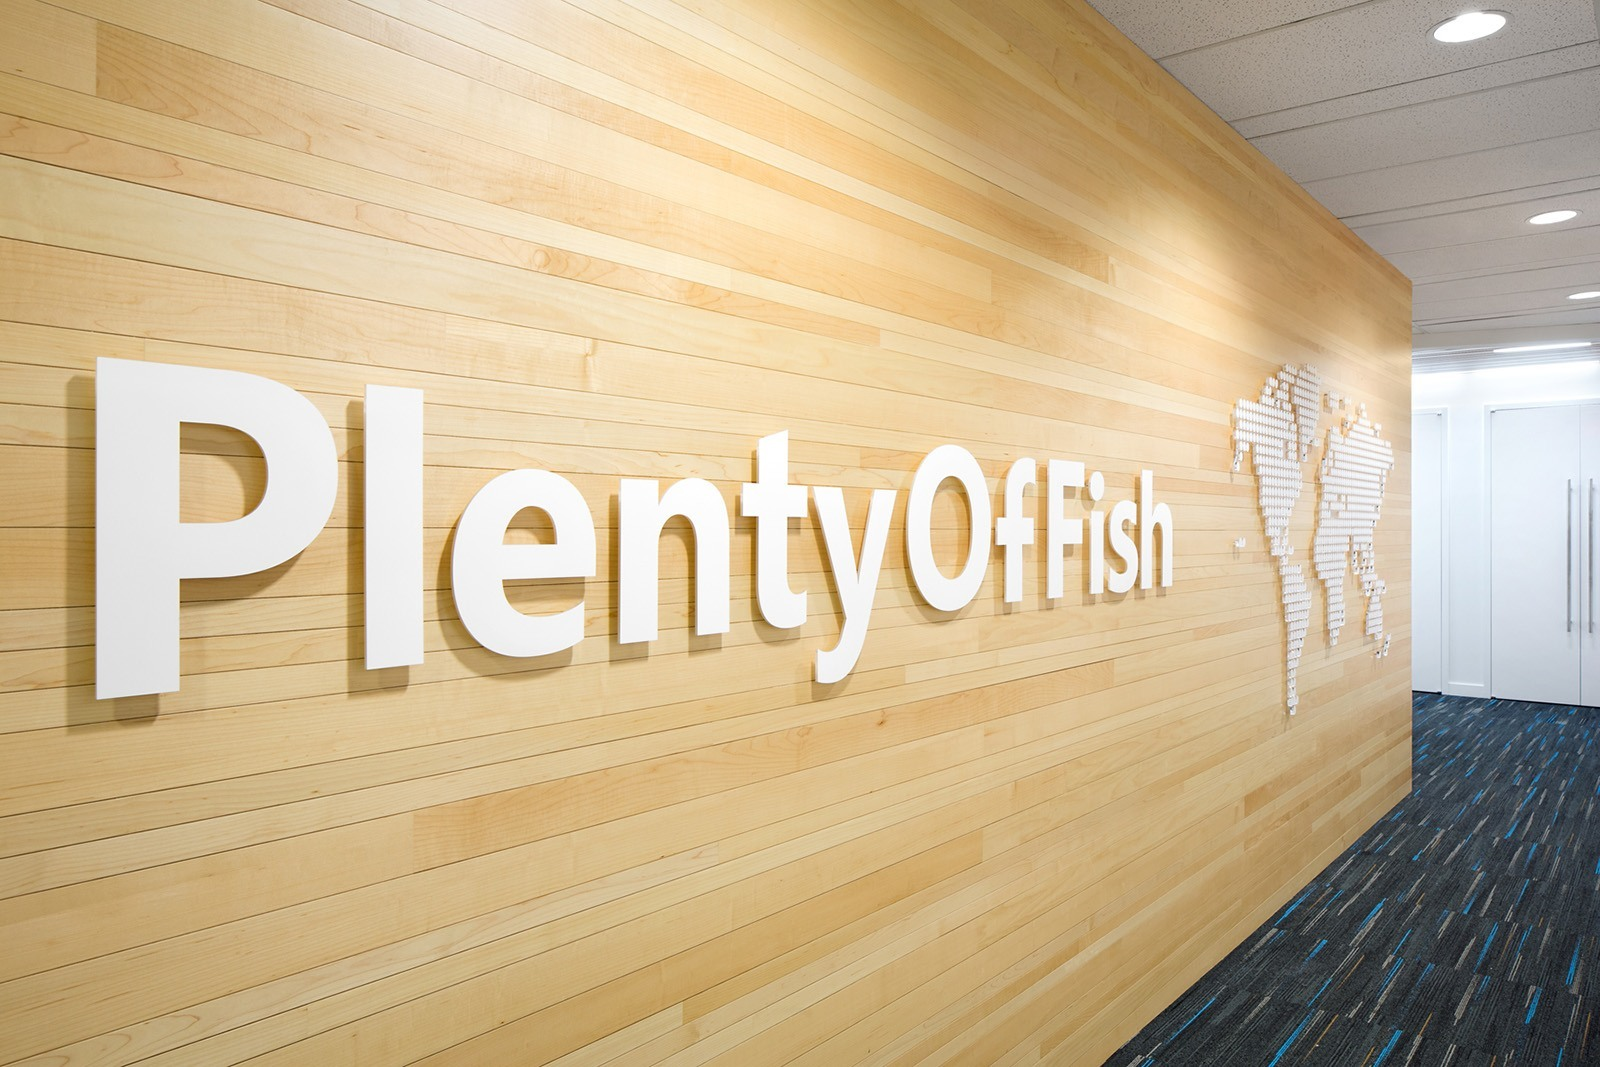 plenty-of-fish-vancouver-office-3